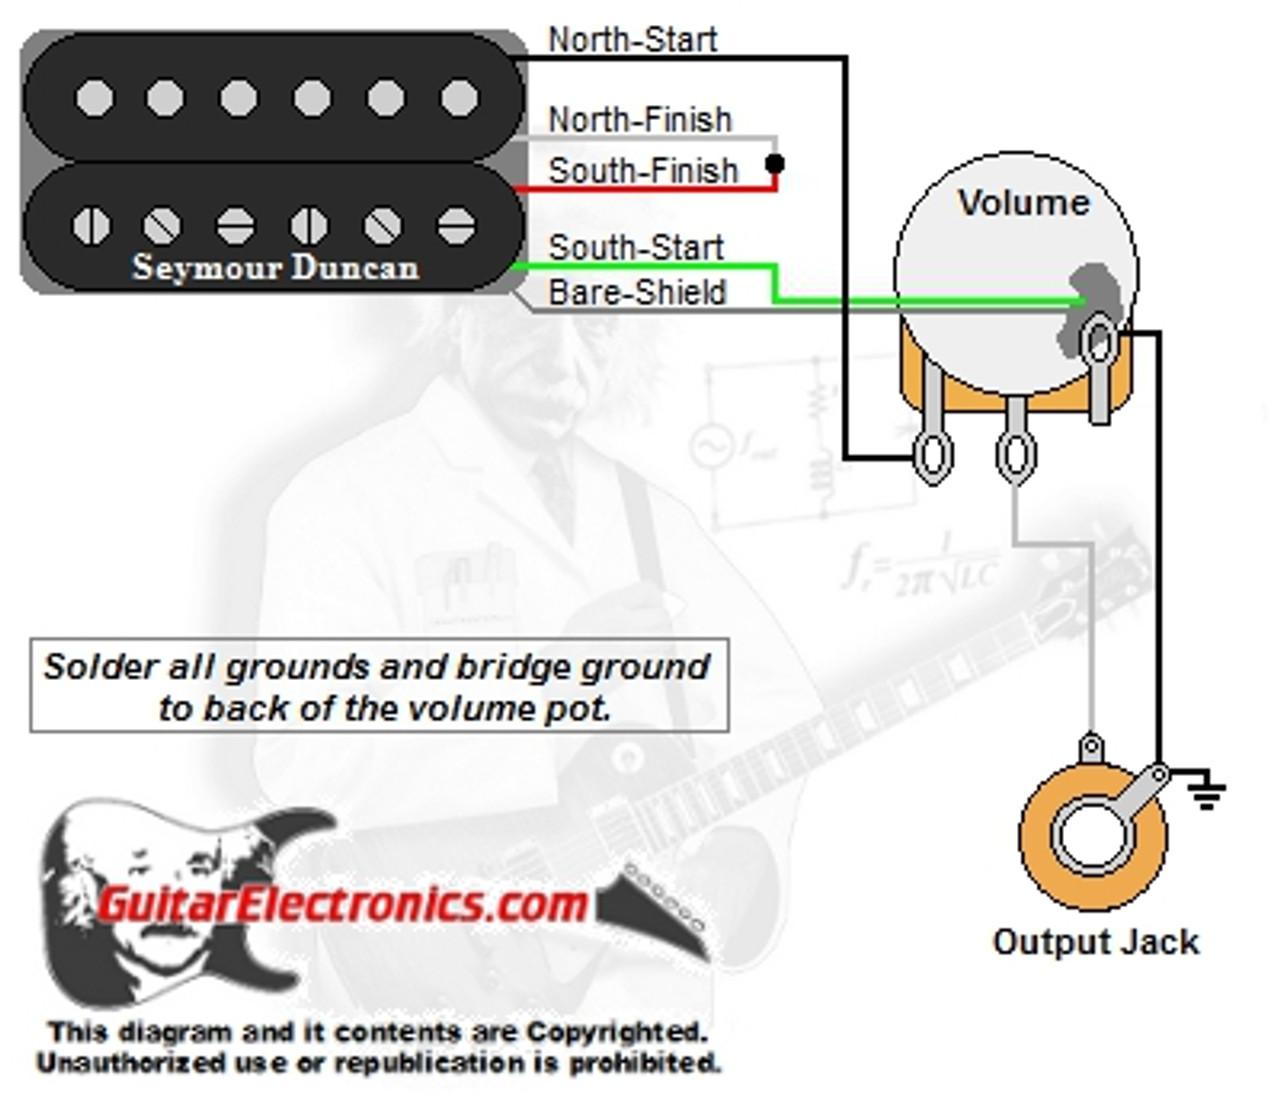 1 Humbucker/1 Volume | Guitar Wiring Diagram 1 Humbucker 1 Volume |  | Guitar Electronics